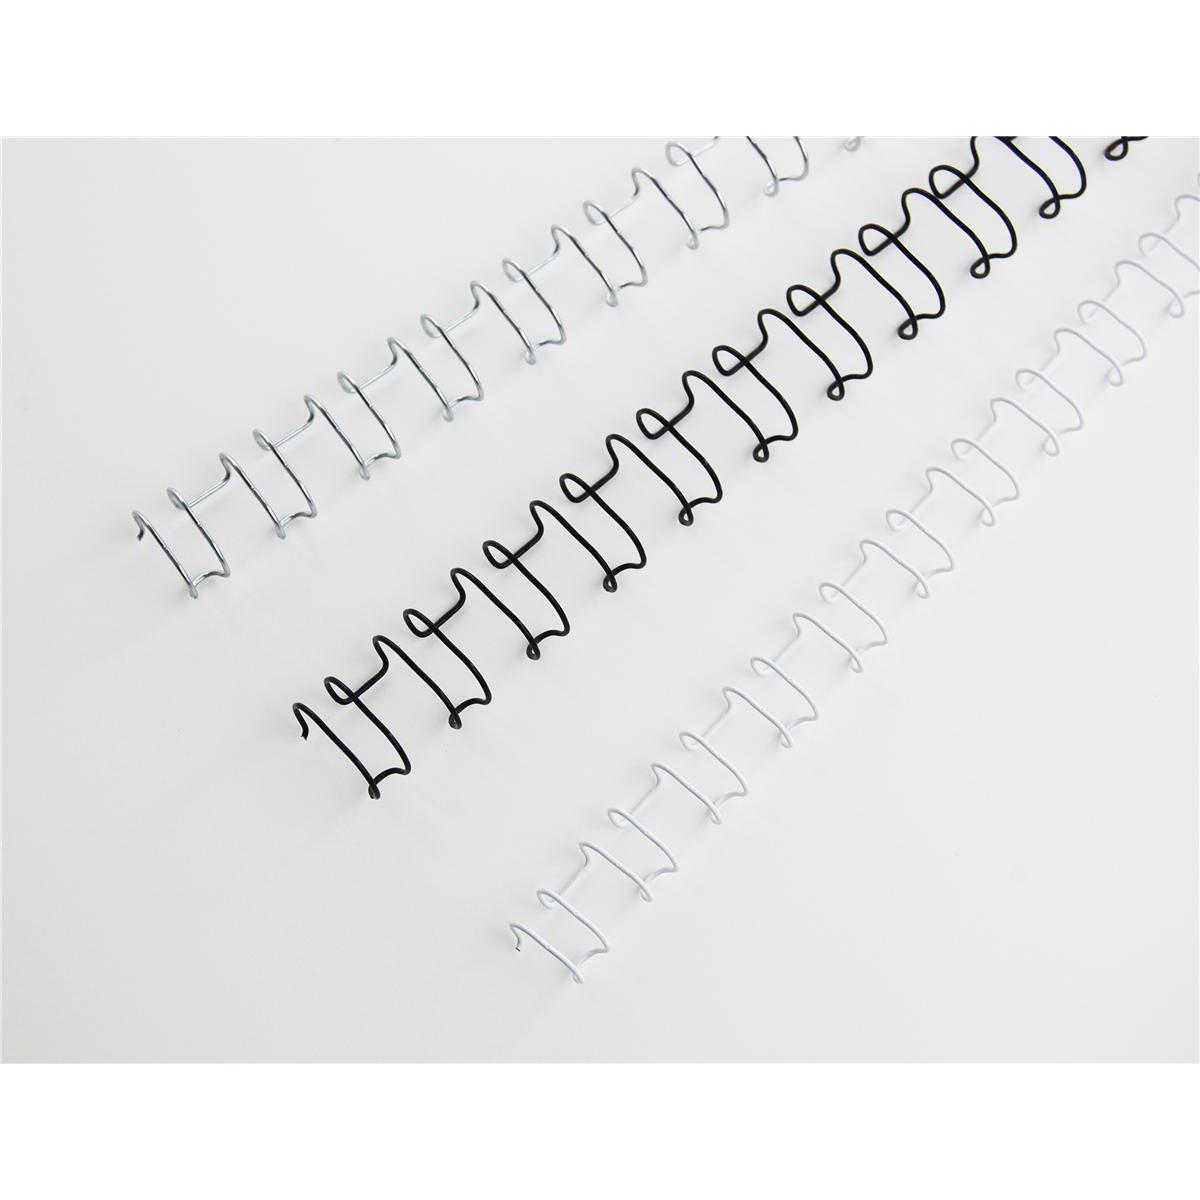 Gbc Multibind 230e Binding Machine Electric Binds Comb And